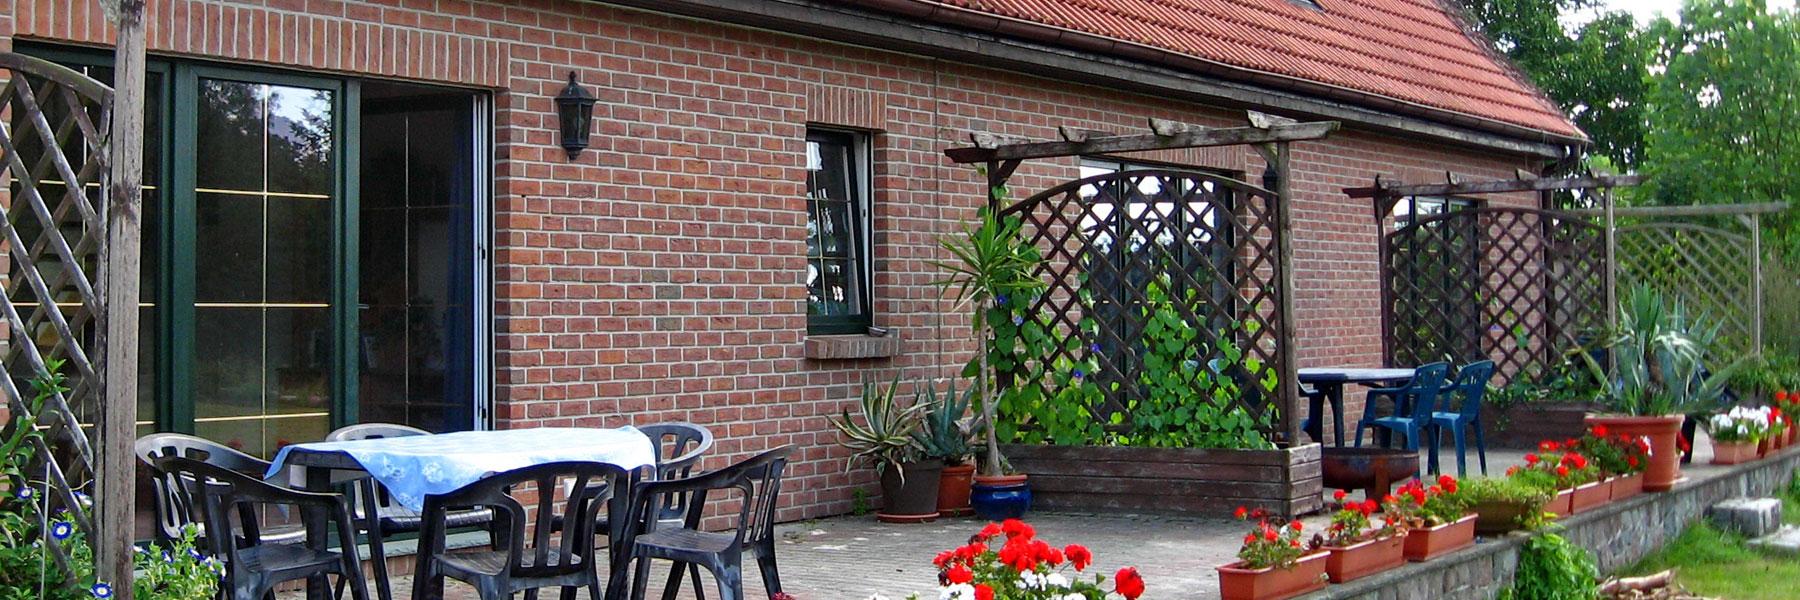 Terrasse - Ferienhof Dinse